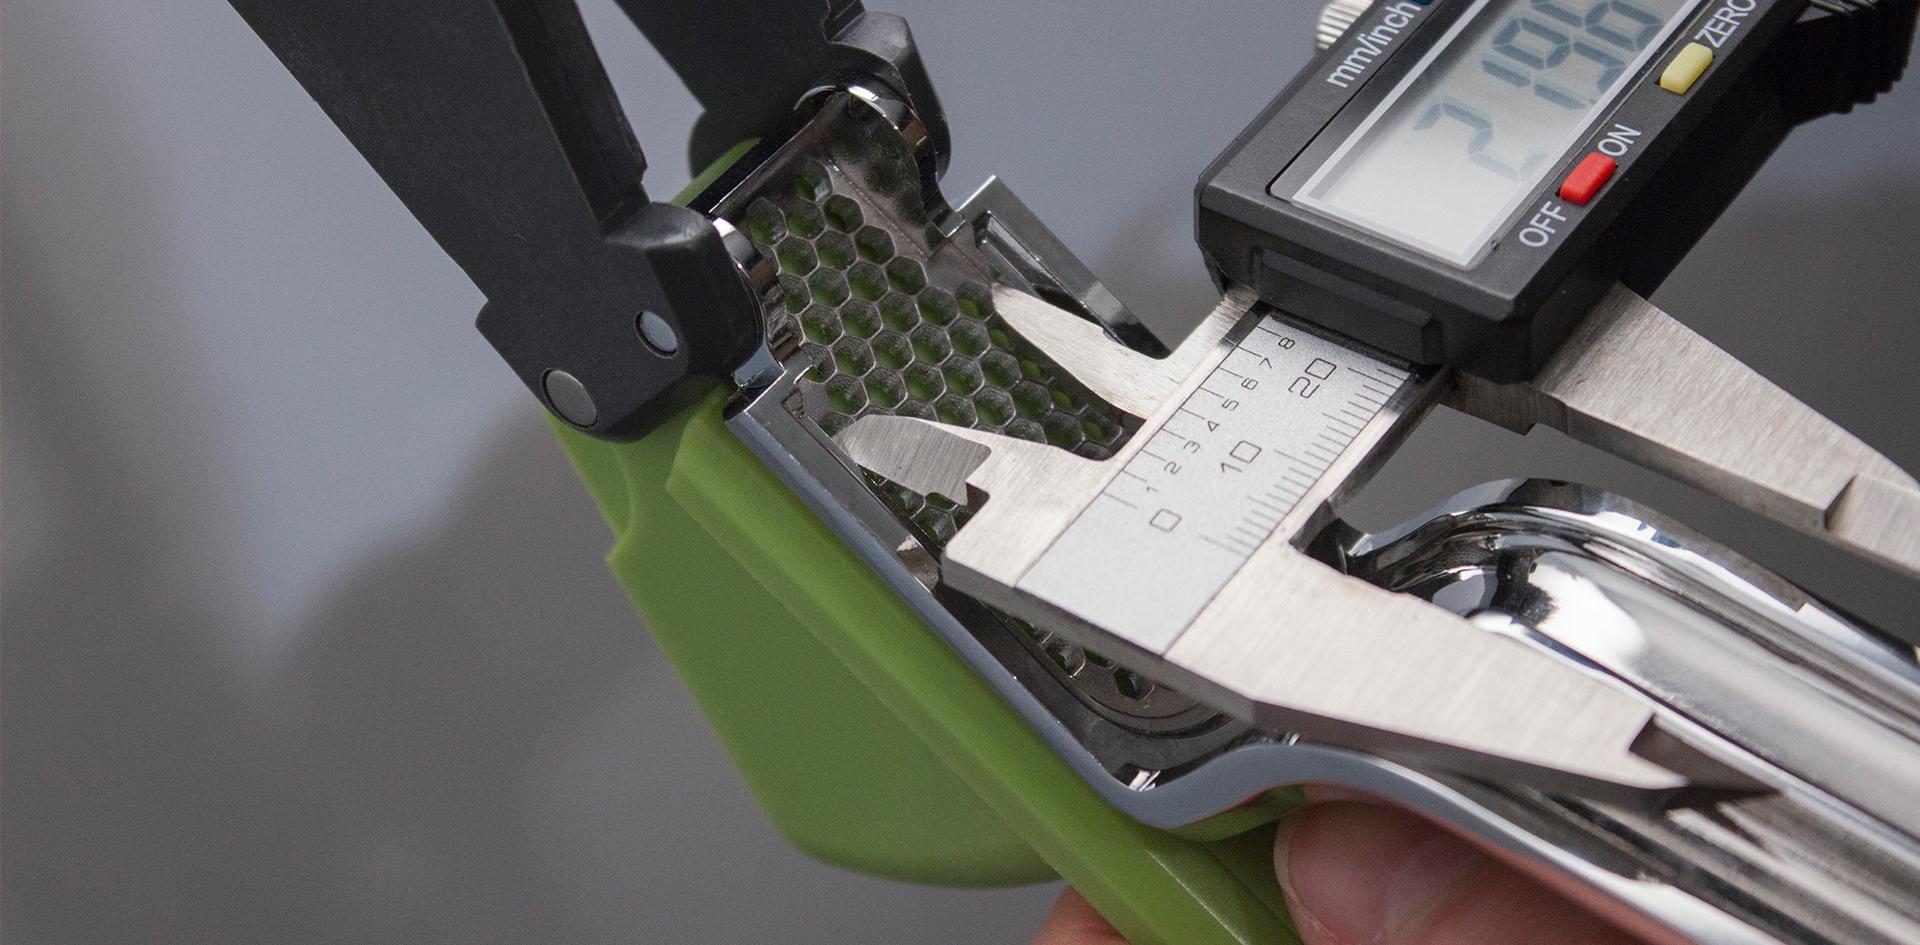 Zeal Garlic press |Measuring and validating tooling